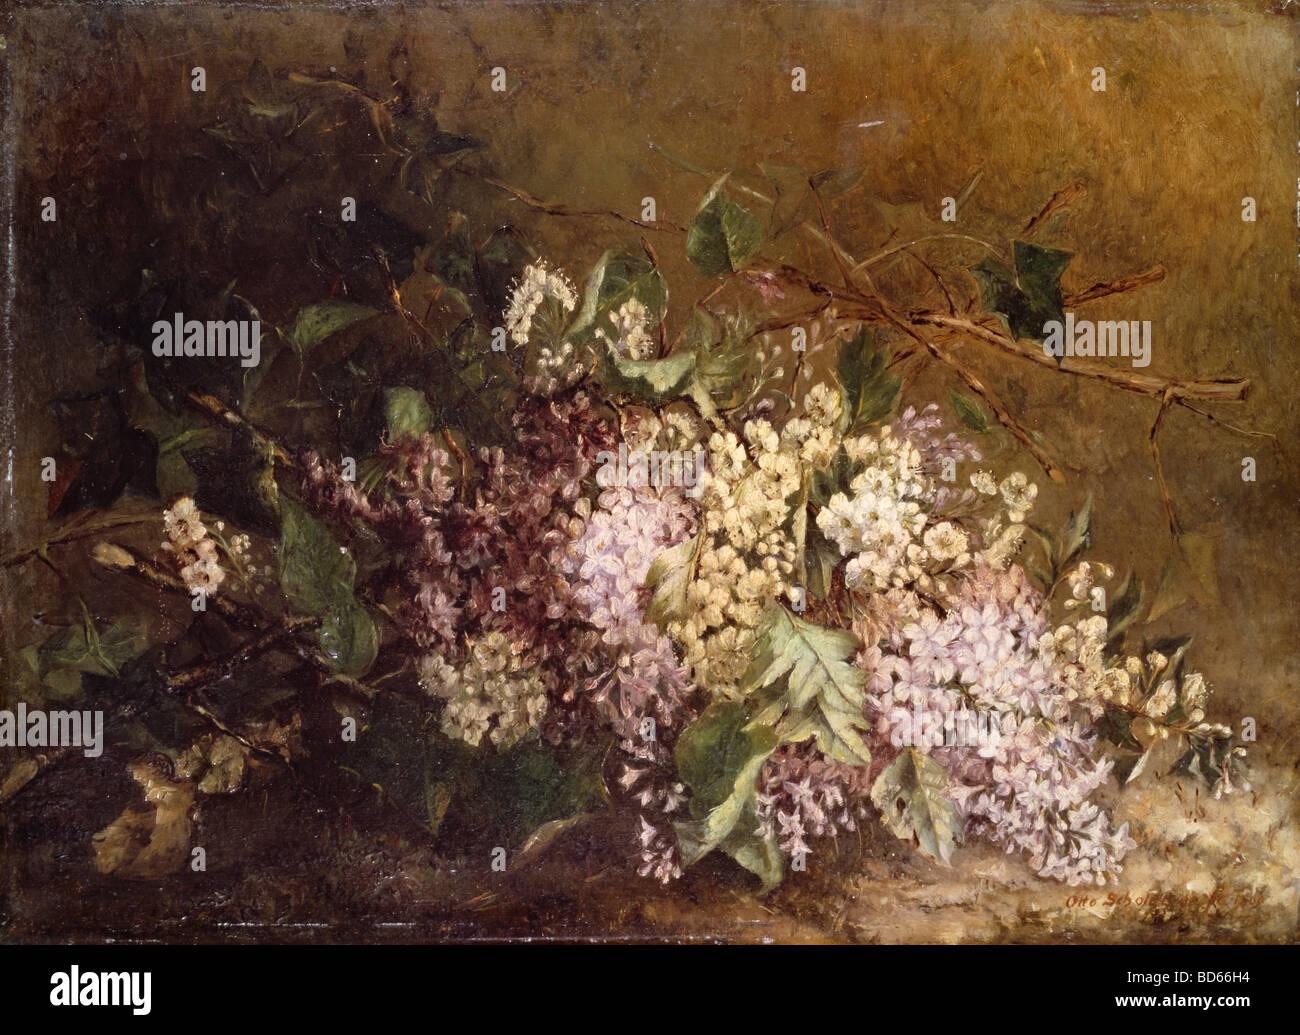 Belle arti, Scholderer, Otto (1834 - 1902), pittura, 'Stillife di lilla' ('Fliederstilleben'), circa 1860, Lindenau Museu Foto Stock